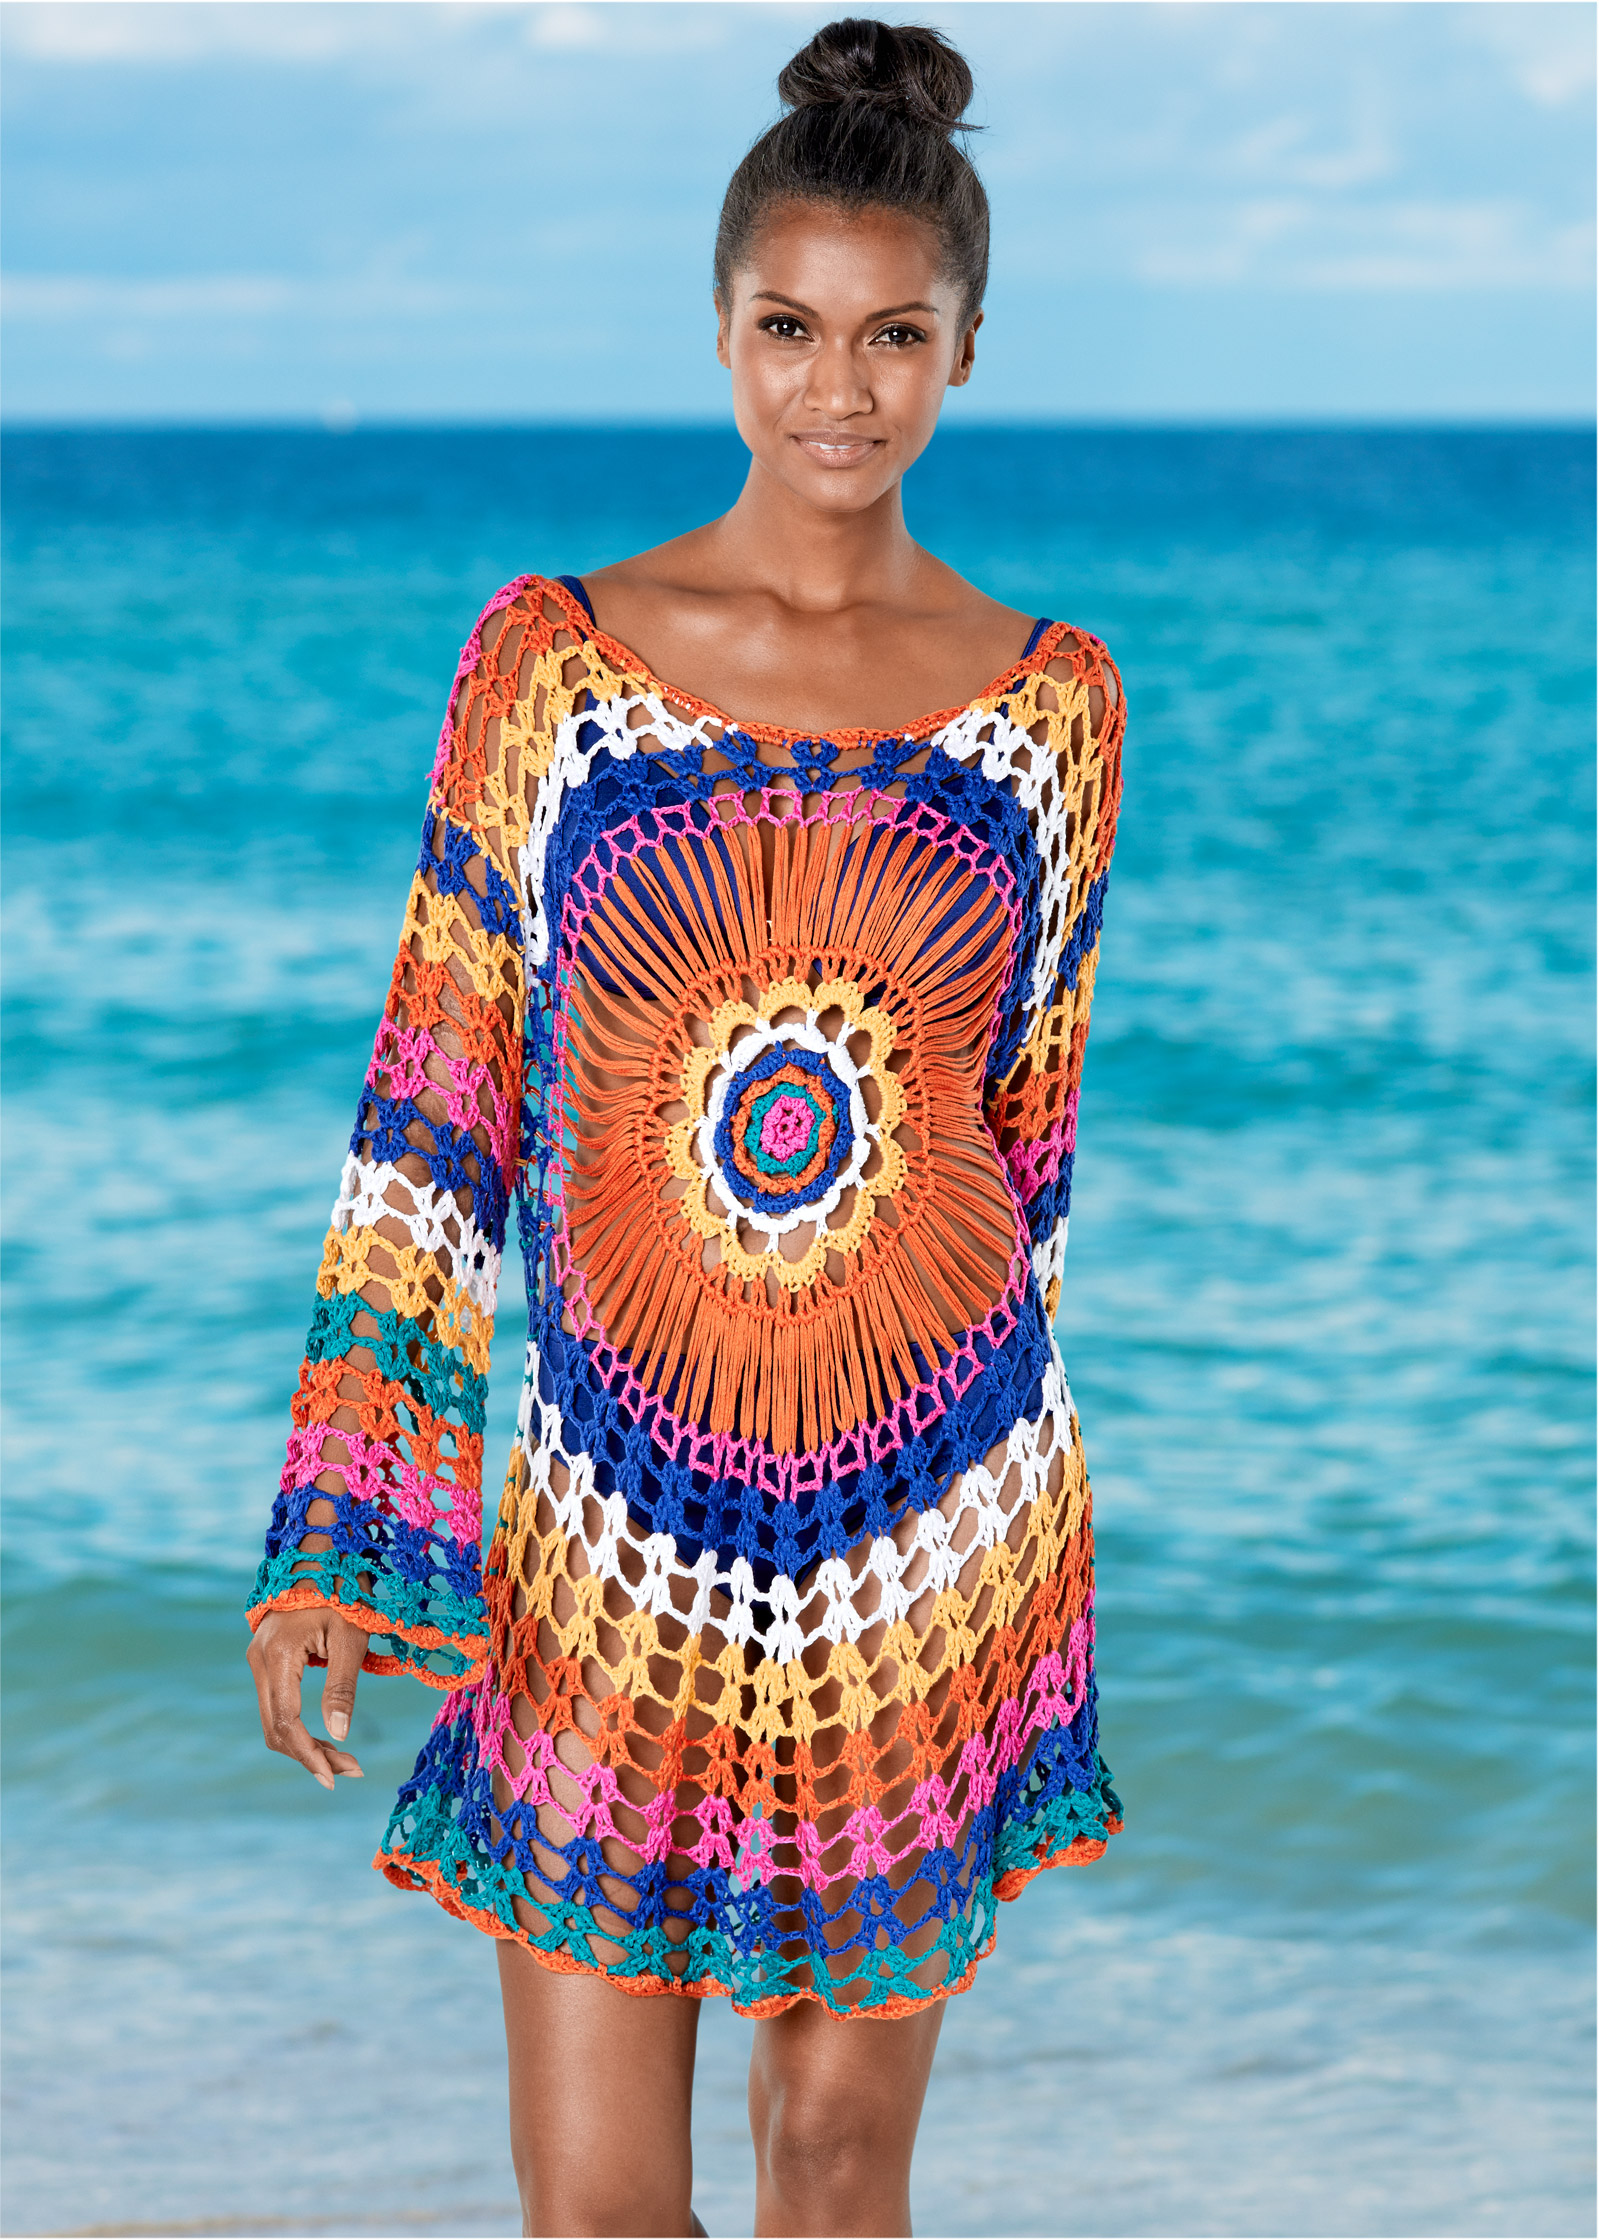 Home Women Summer Long Sleeves Bikini Cover Up Crochet Floral Lace Drawstring High Waist Maxi Cardigan Button Down Beach Dress